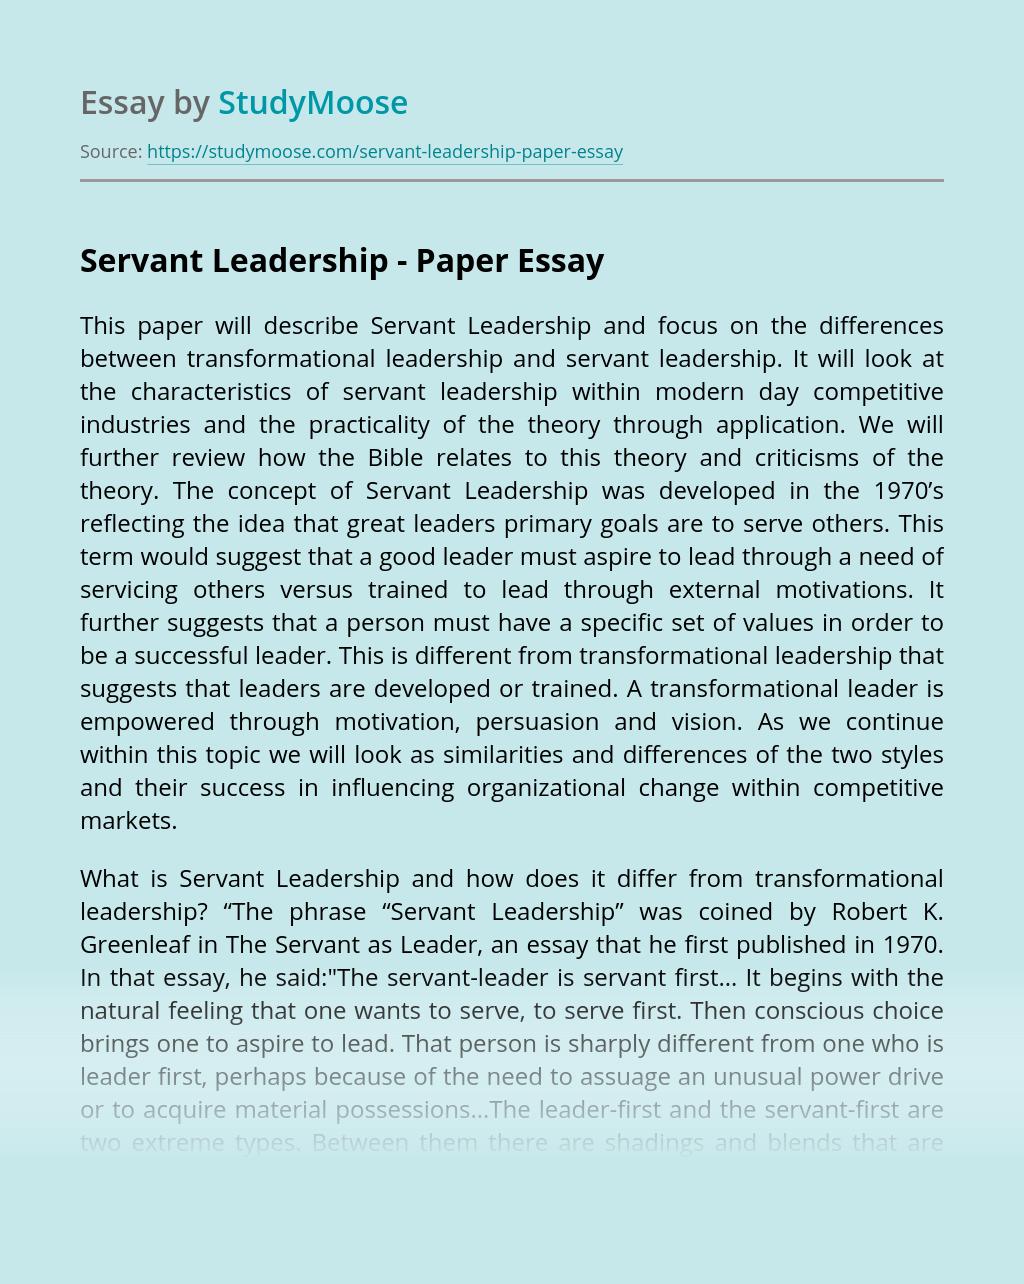 Servant Leadership - Paper